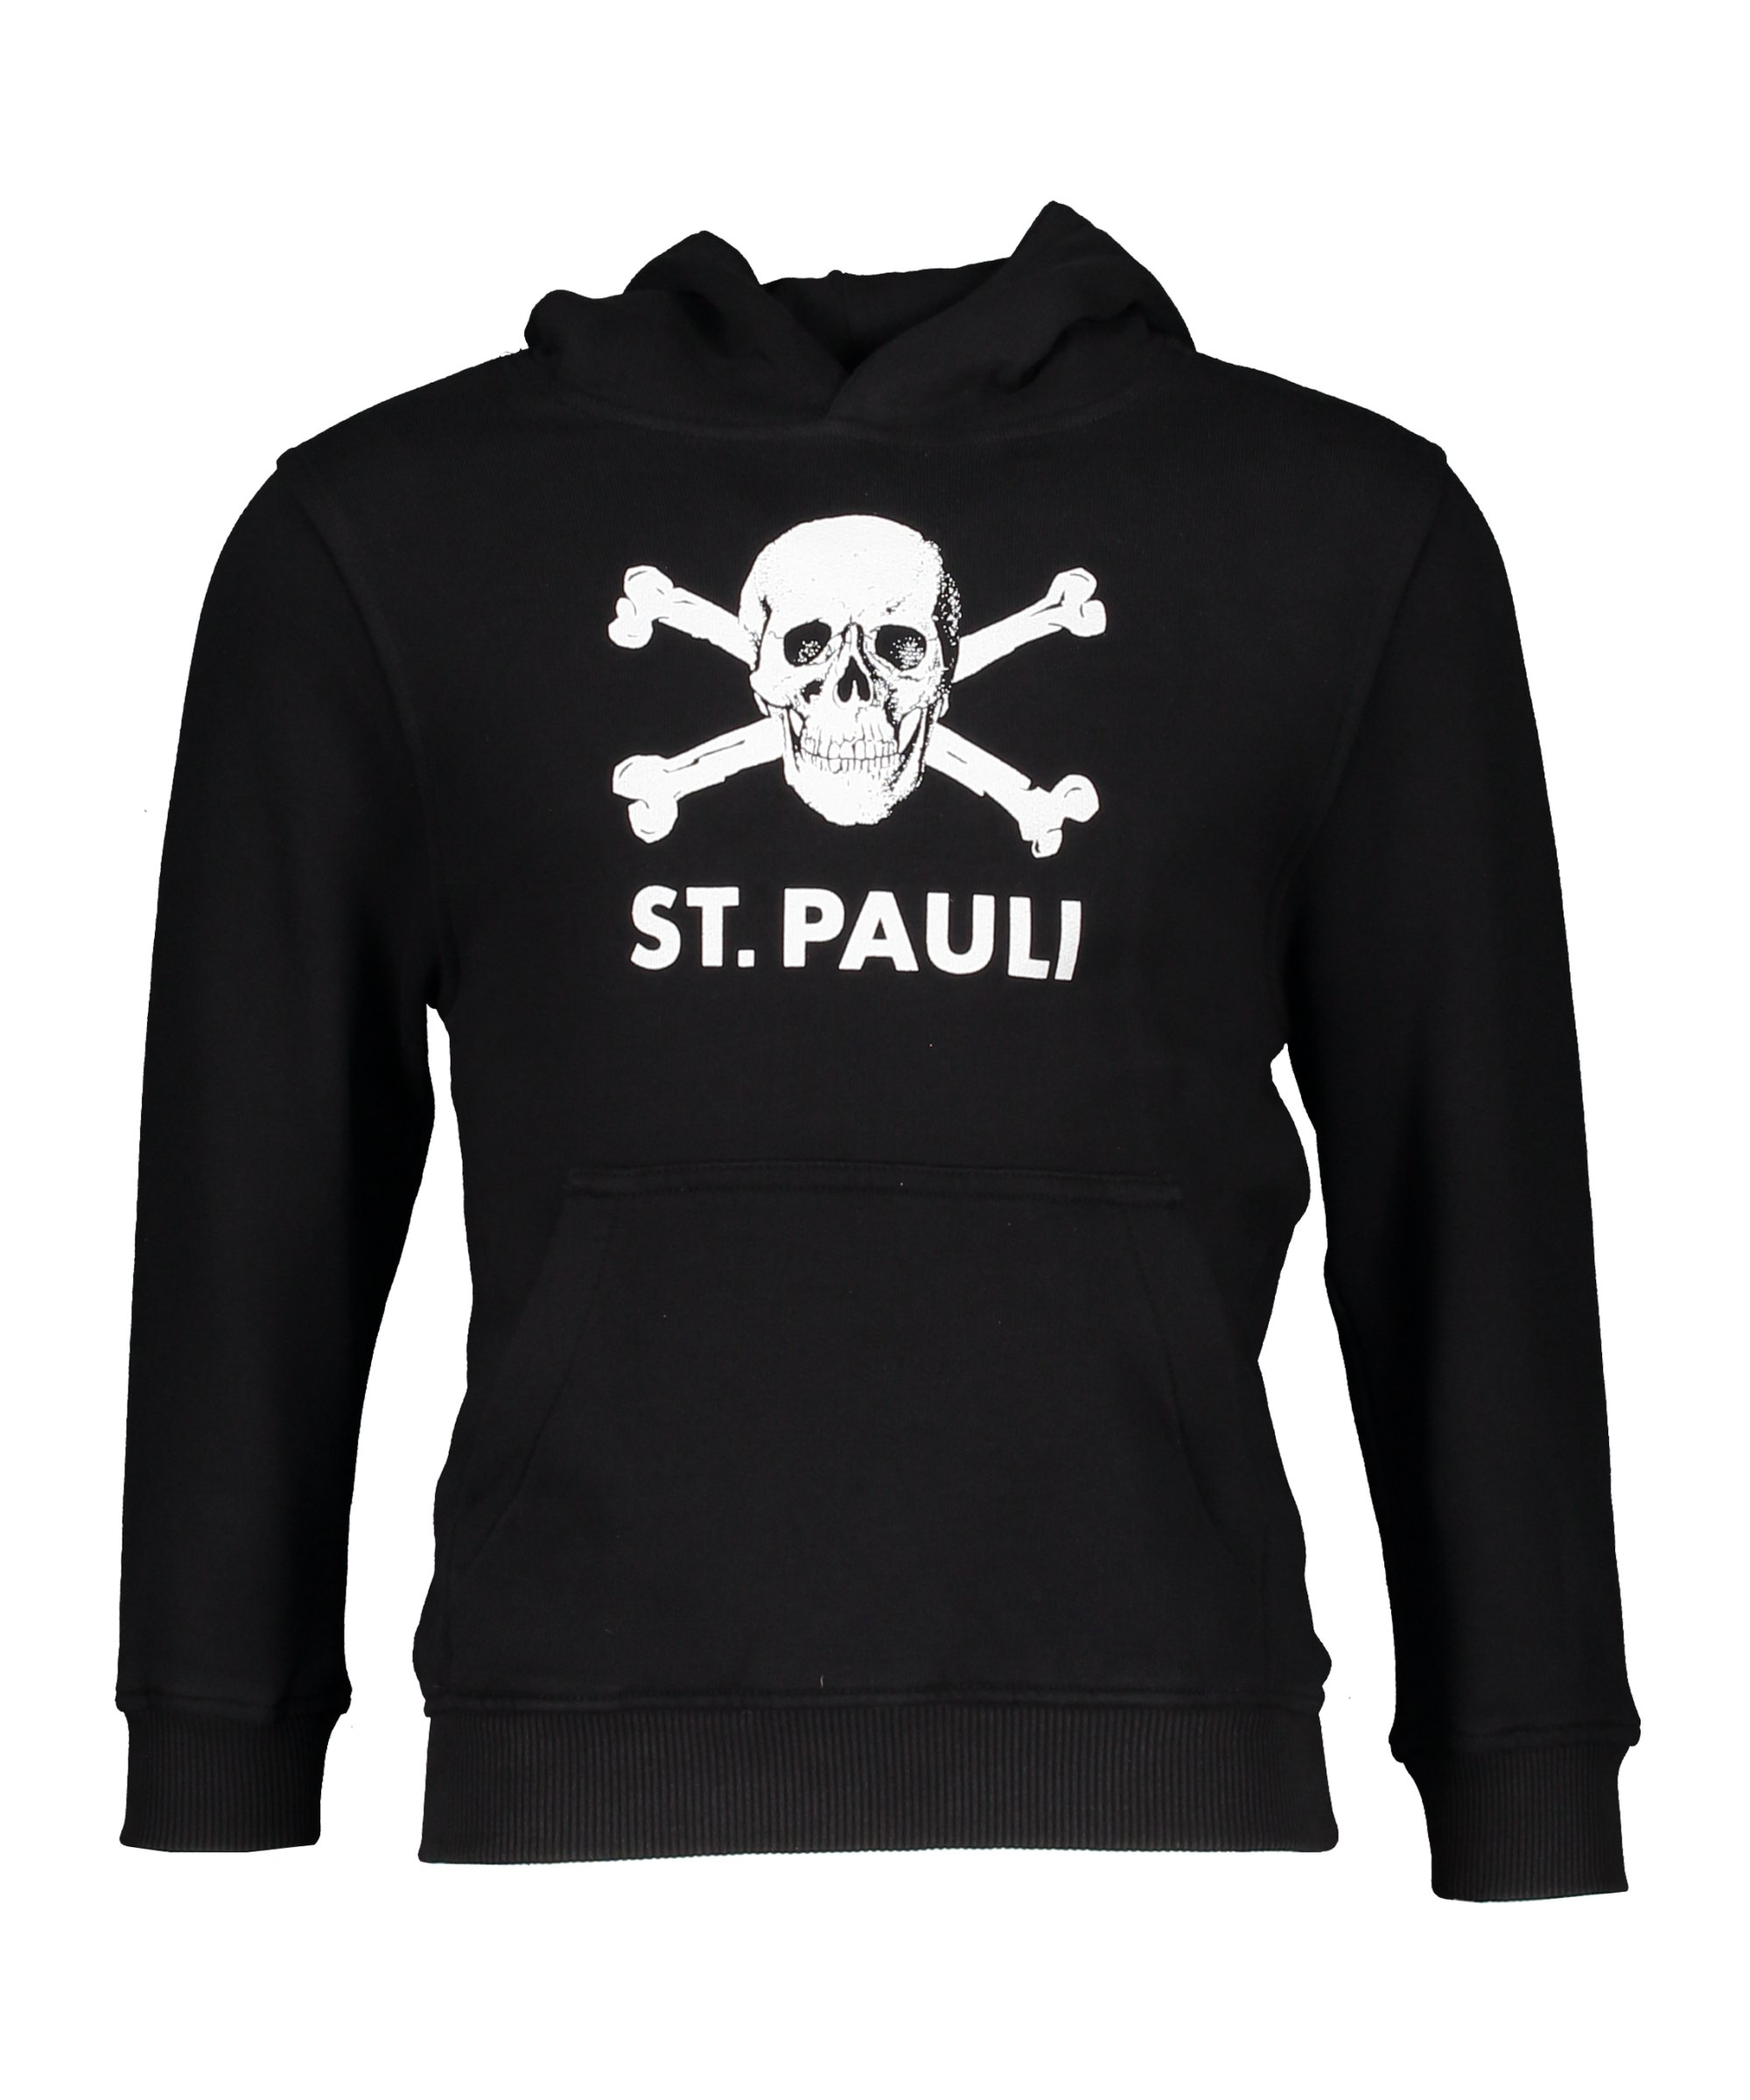 FC St. Pauli Totenkopf Hoody Kinder Schwarz Weiss - schwarz